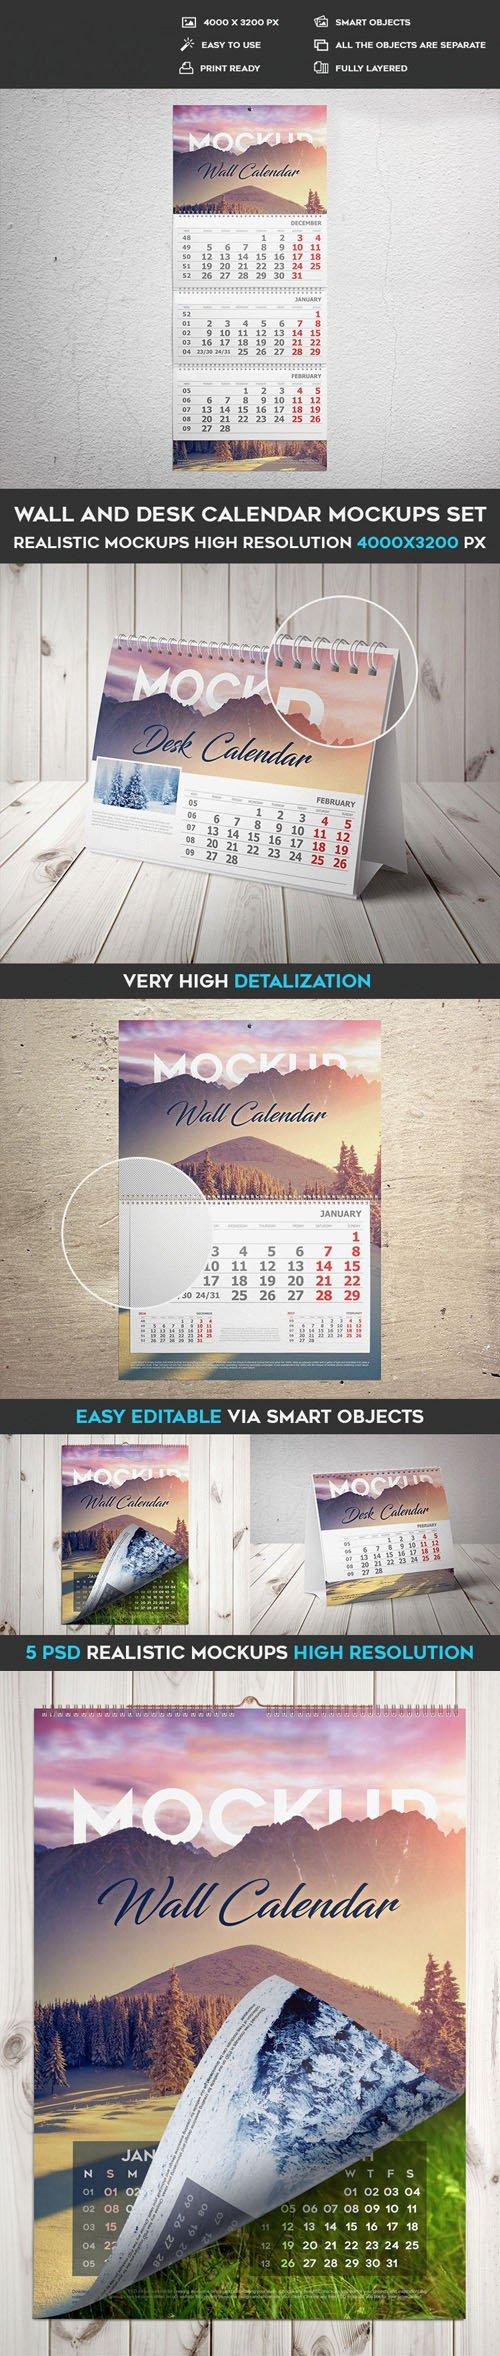 Wall & Desk Calendar PSD Mockups Templates